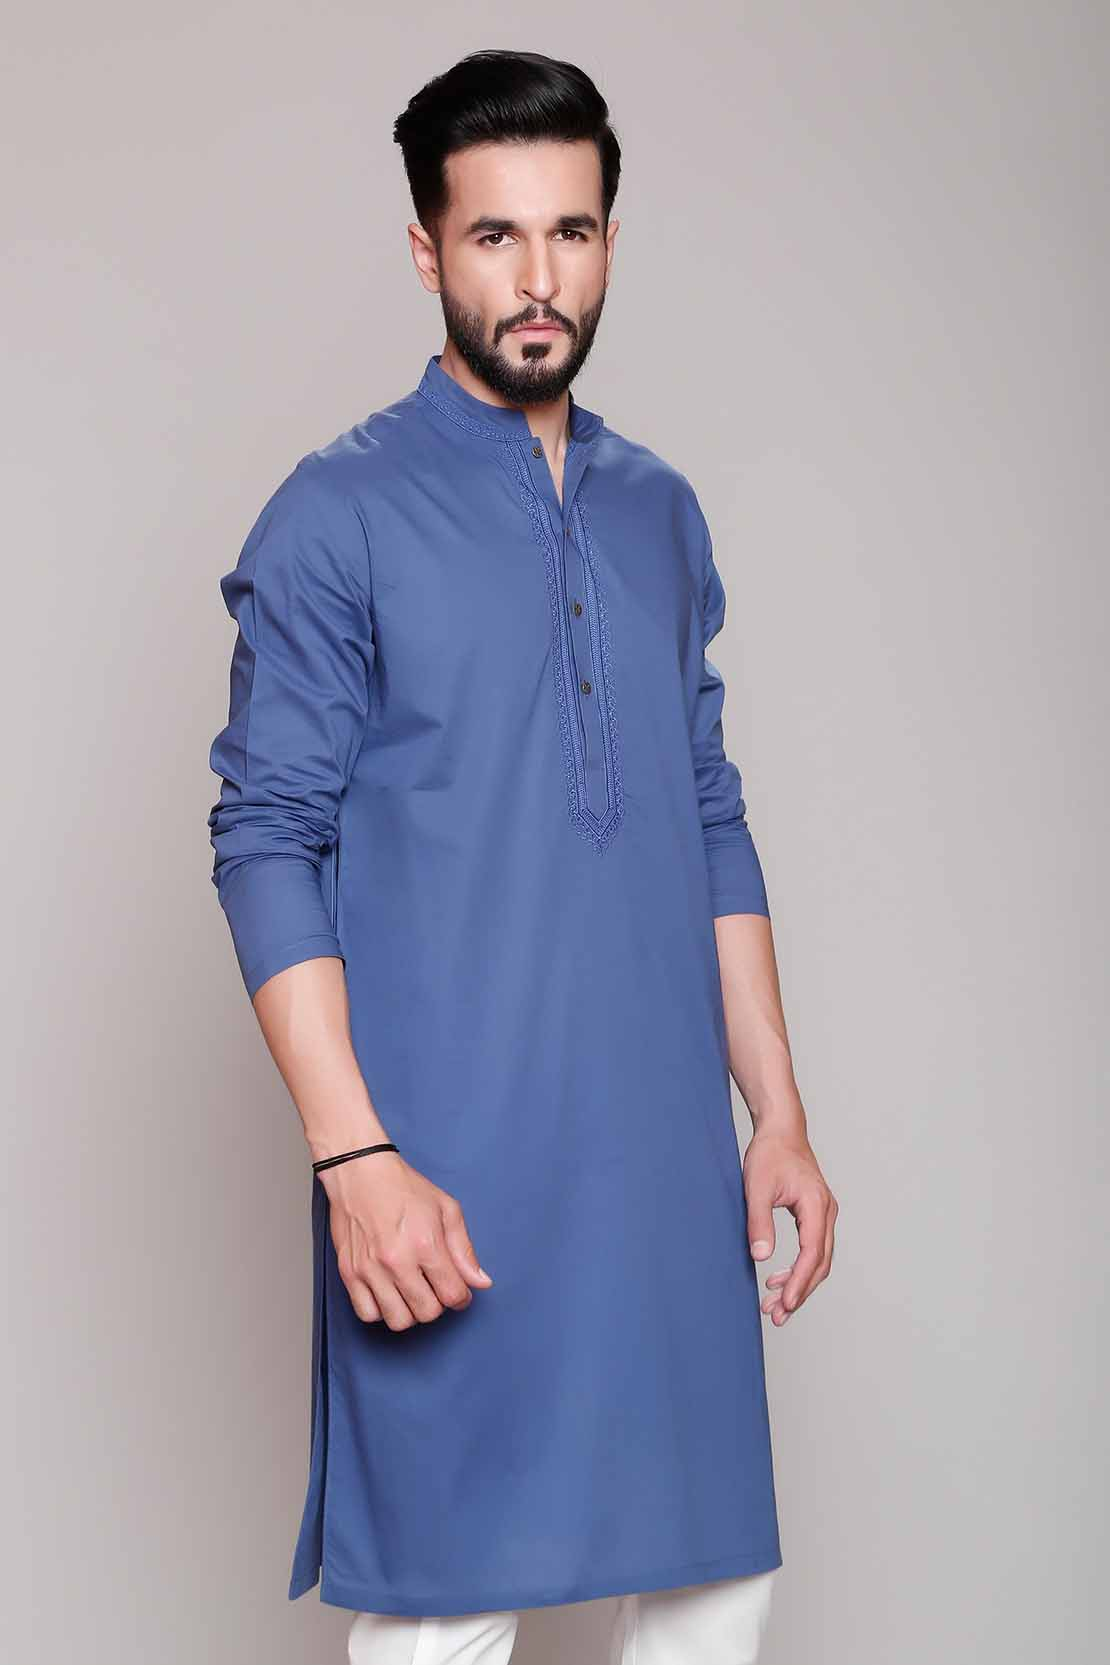 Eid kids kurta shalwar kameez designs 2013 2014 - Latest Eid Men Kurta Shalwar Kameez Designs Collection 2017 2018 3 See